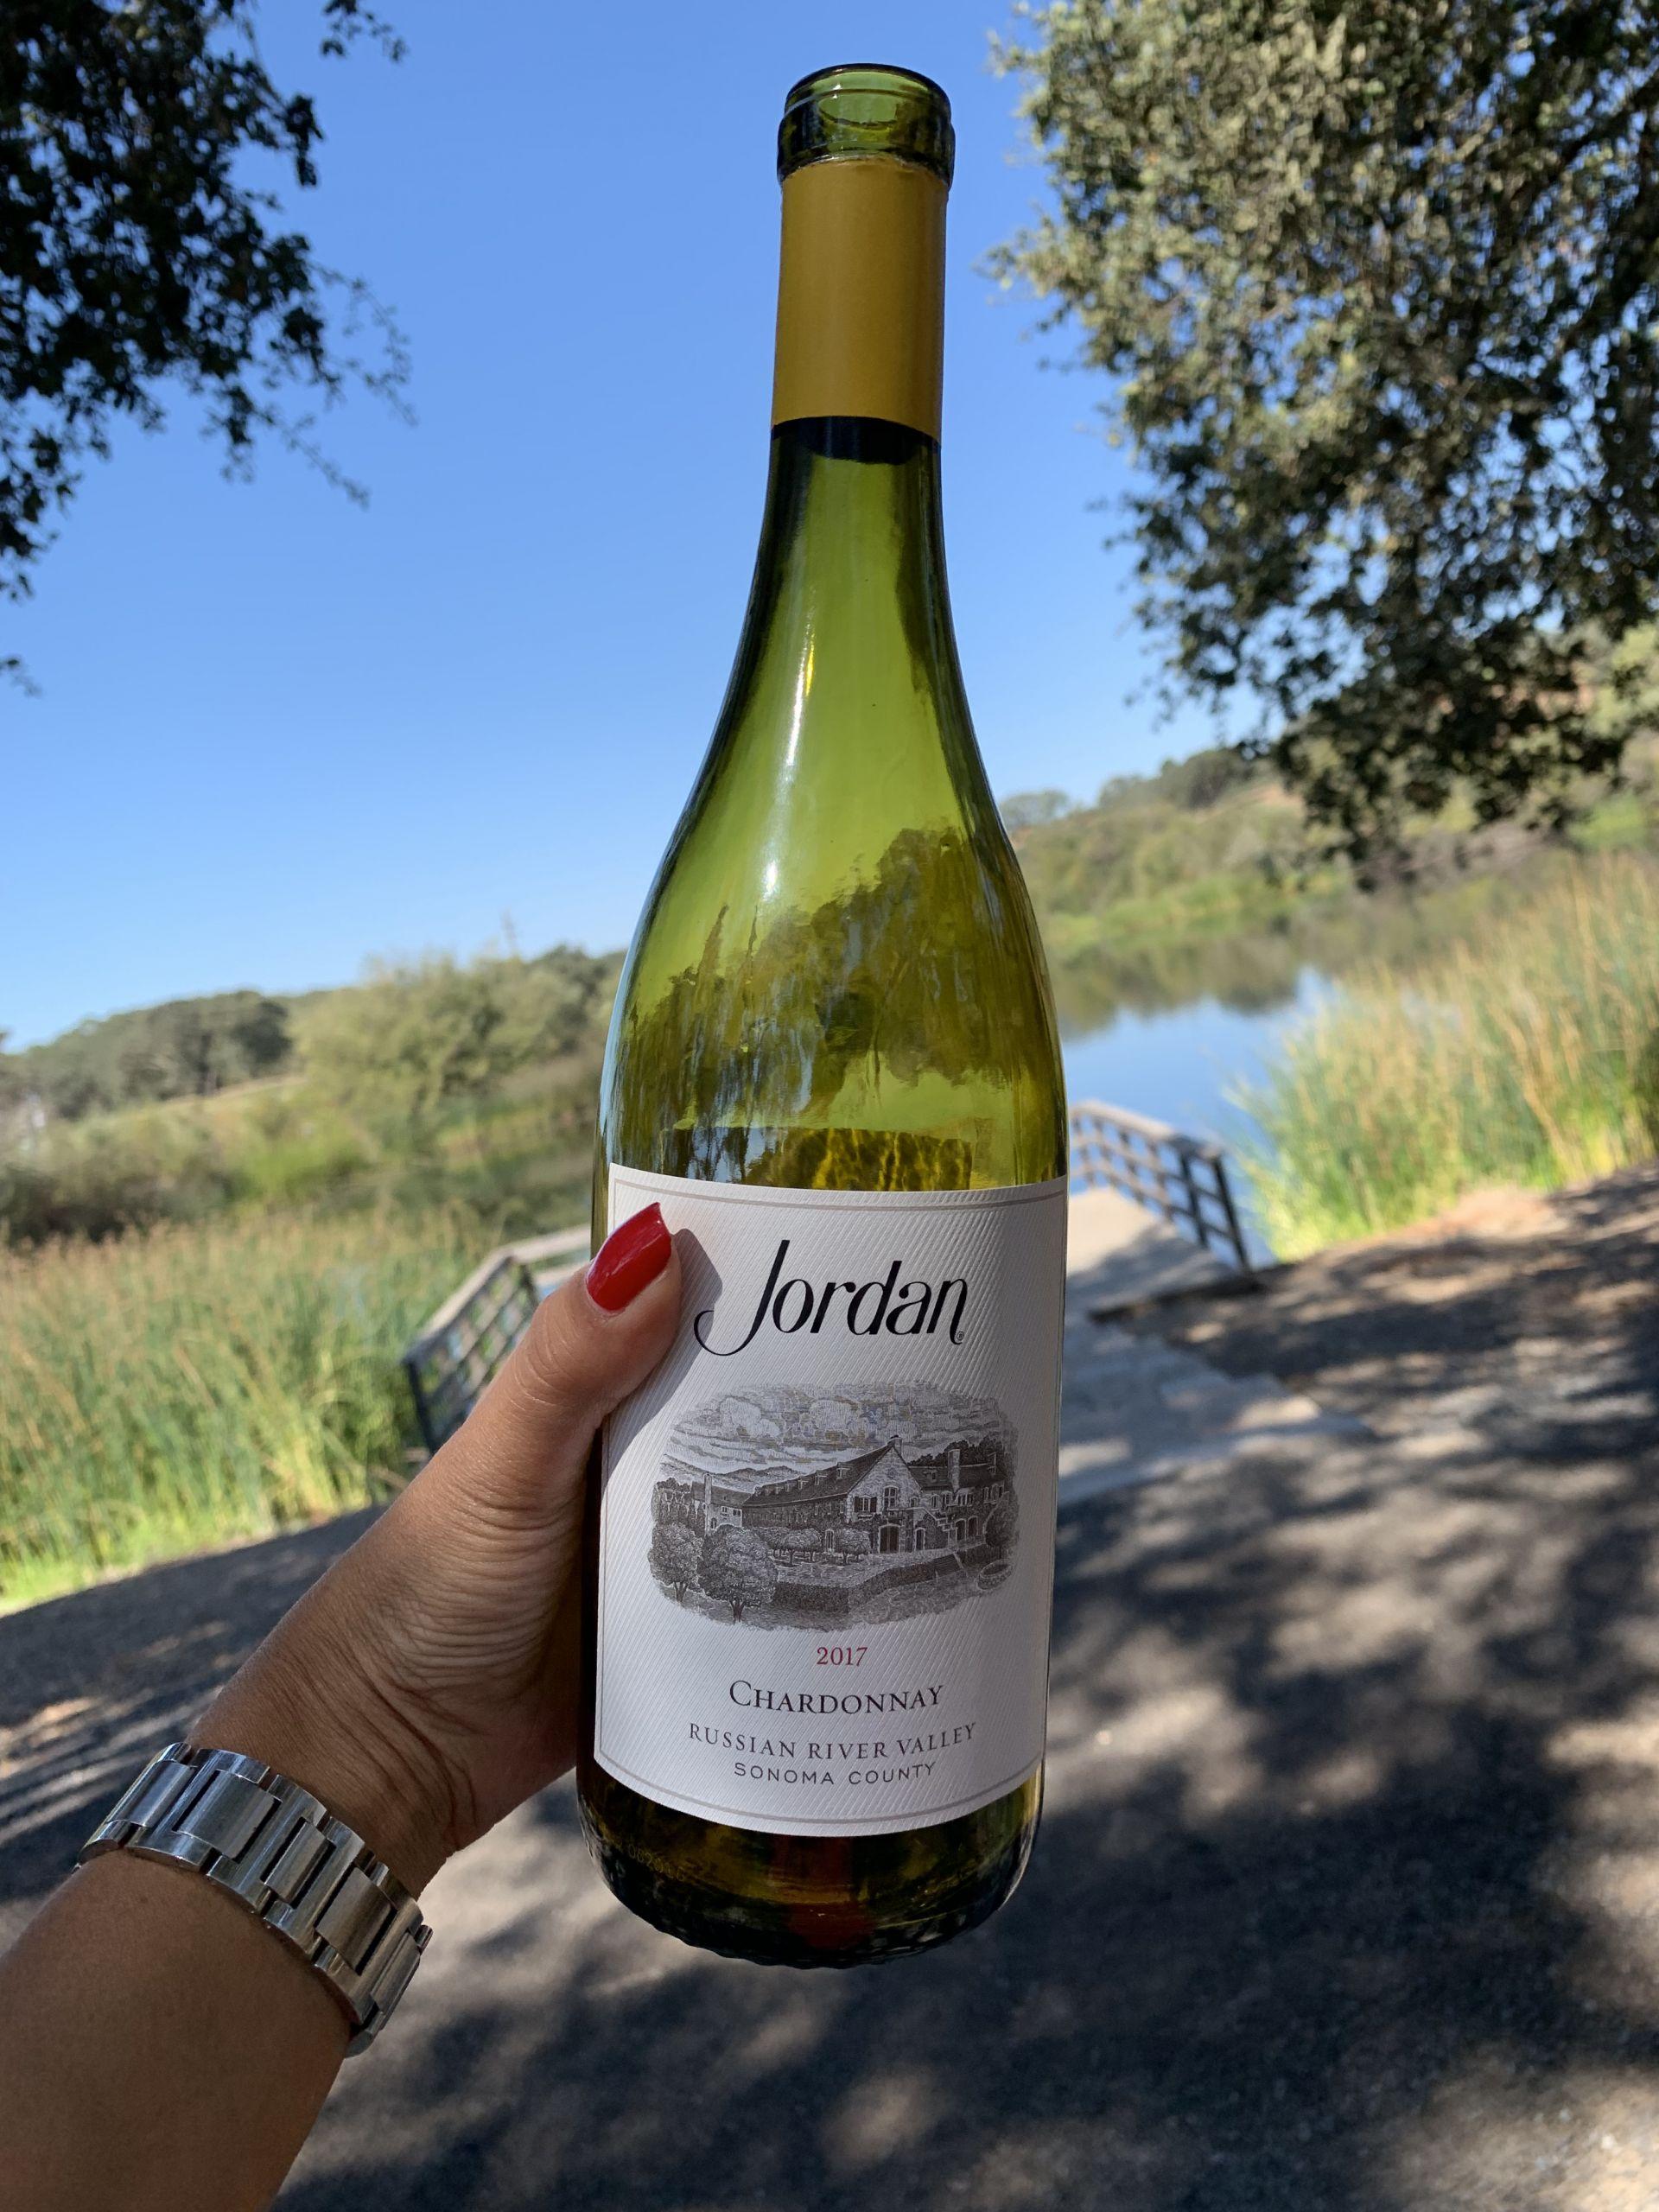 Jordan Winery, Best healdsburg winery, Best sonoma winery guide, Red Soles and Red Wine, Jordan Estate Tour